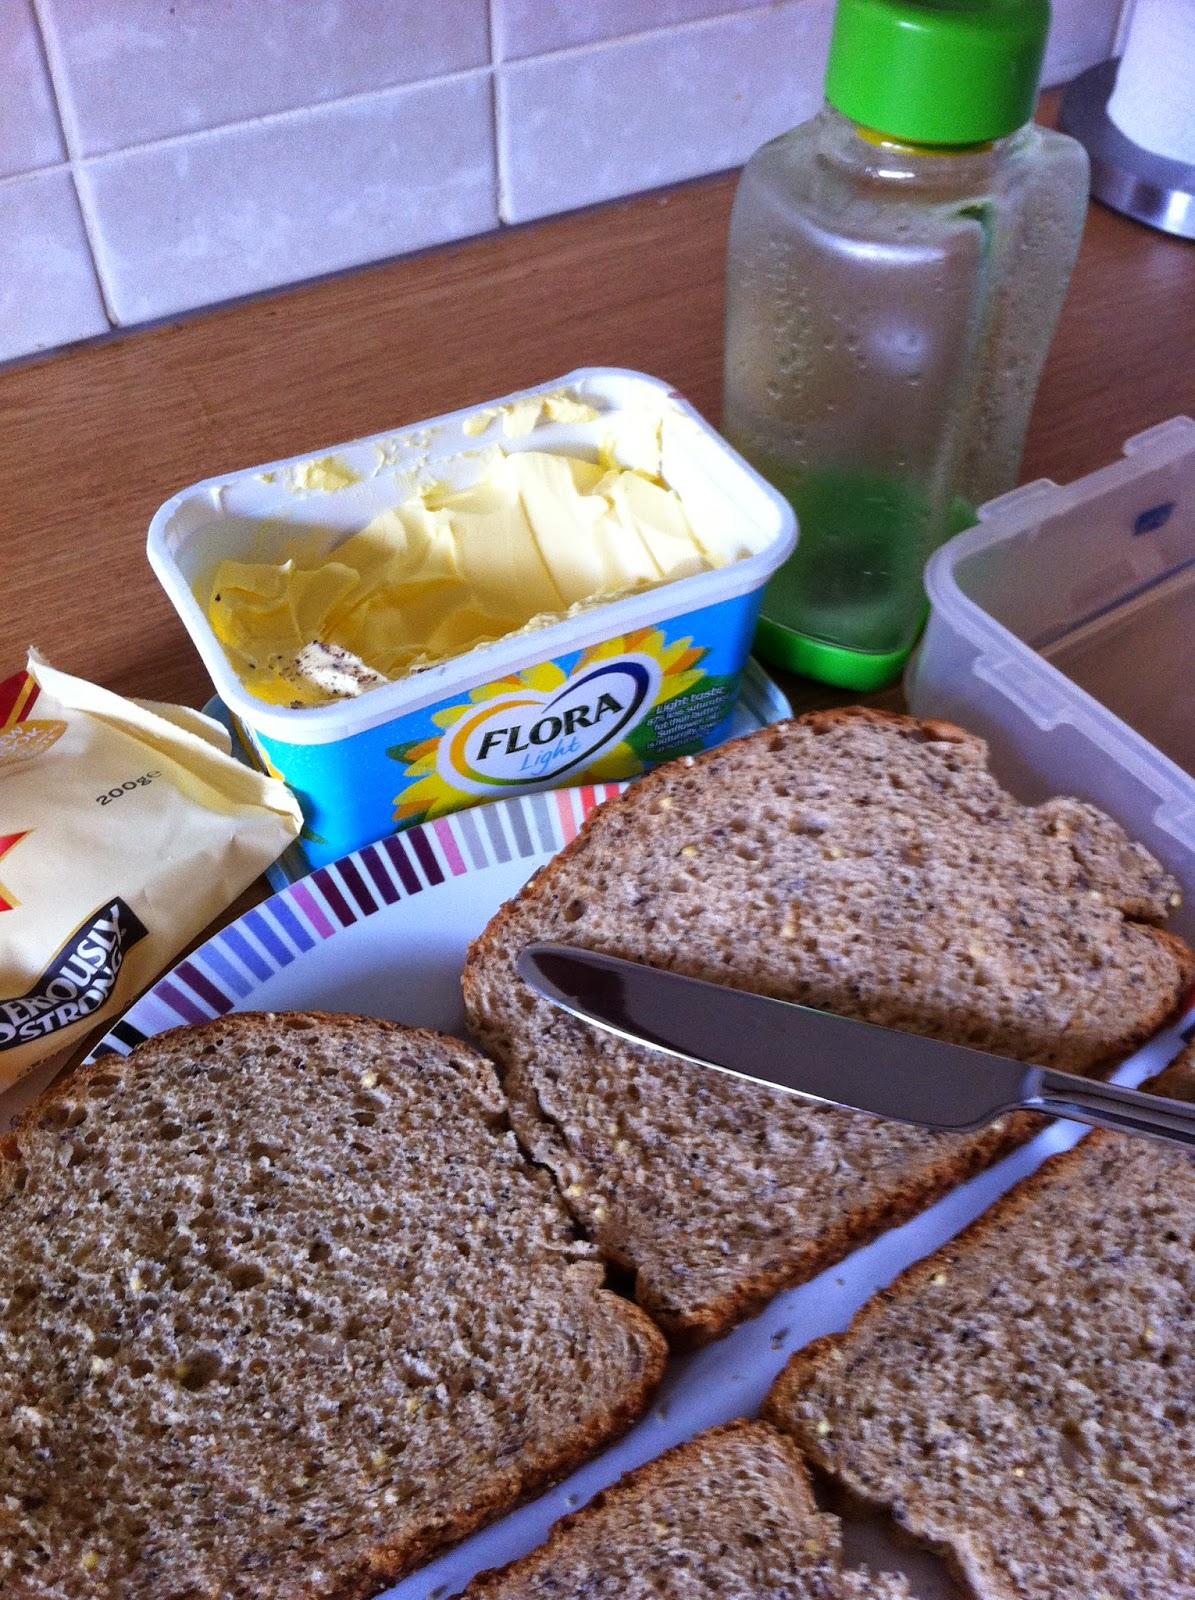 Work-redundancy-kids-school-packed-lunch